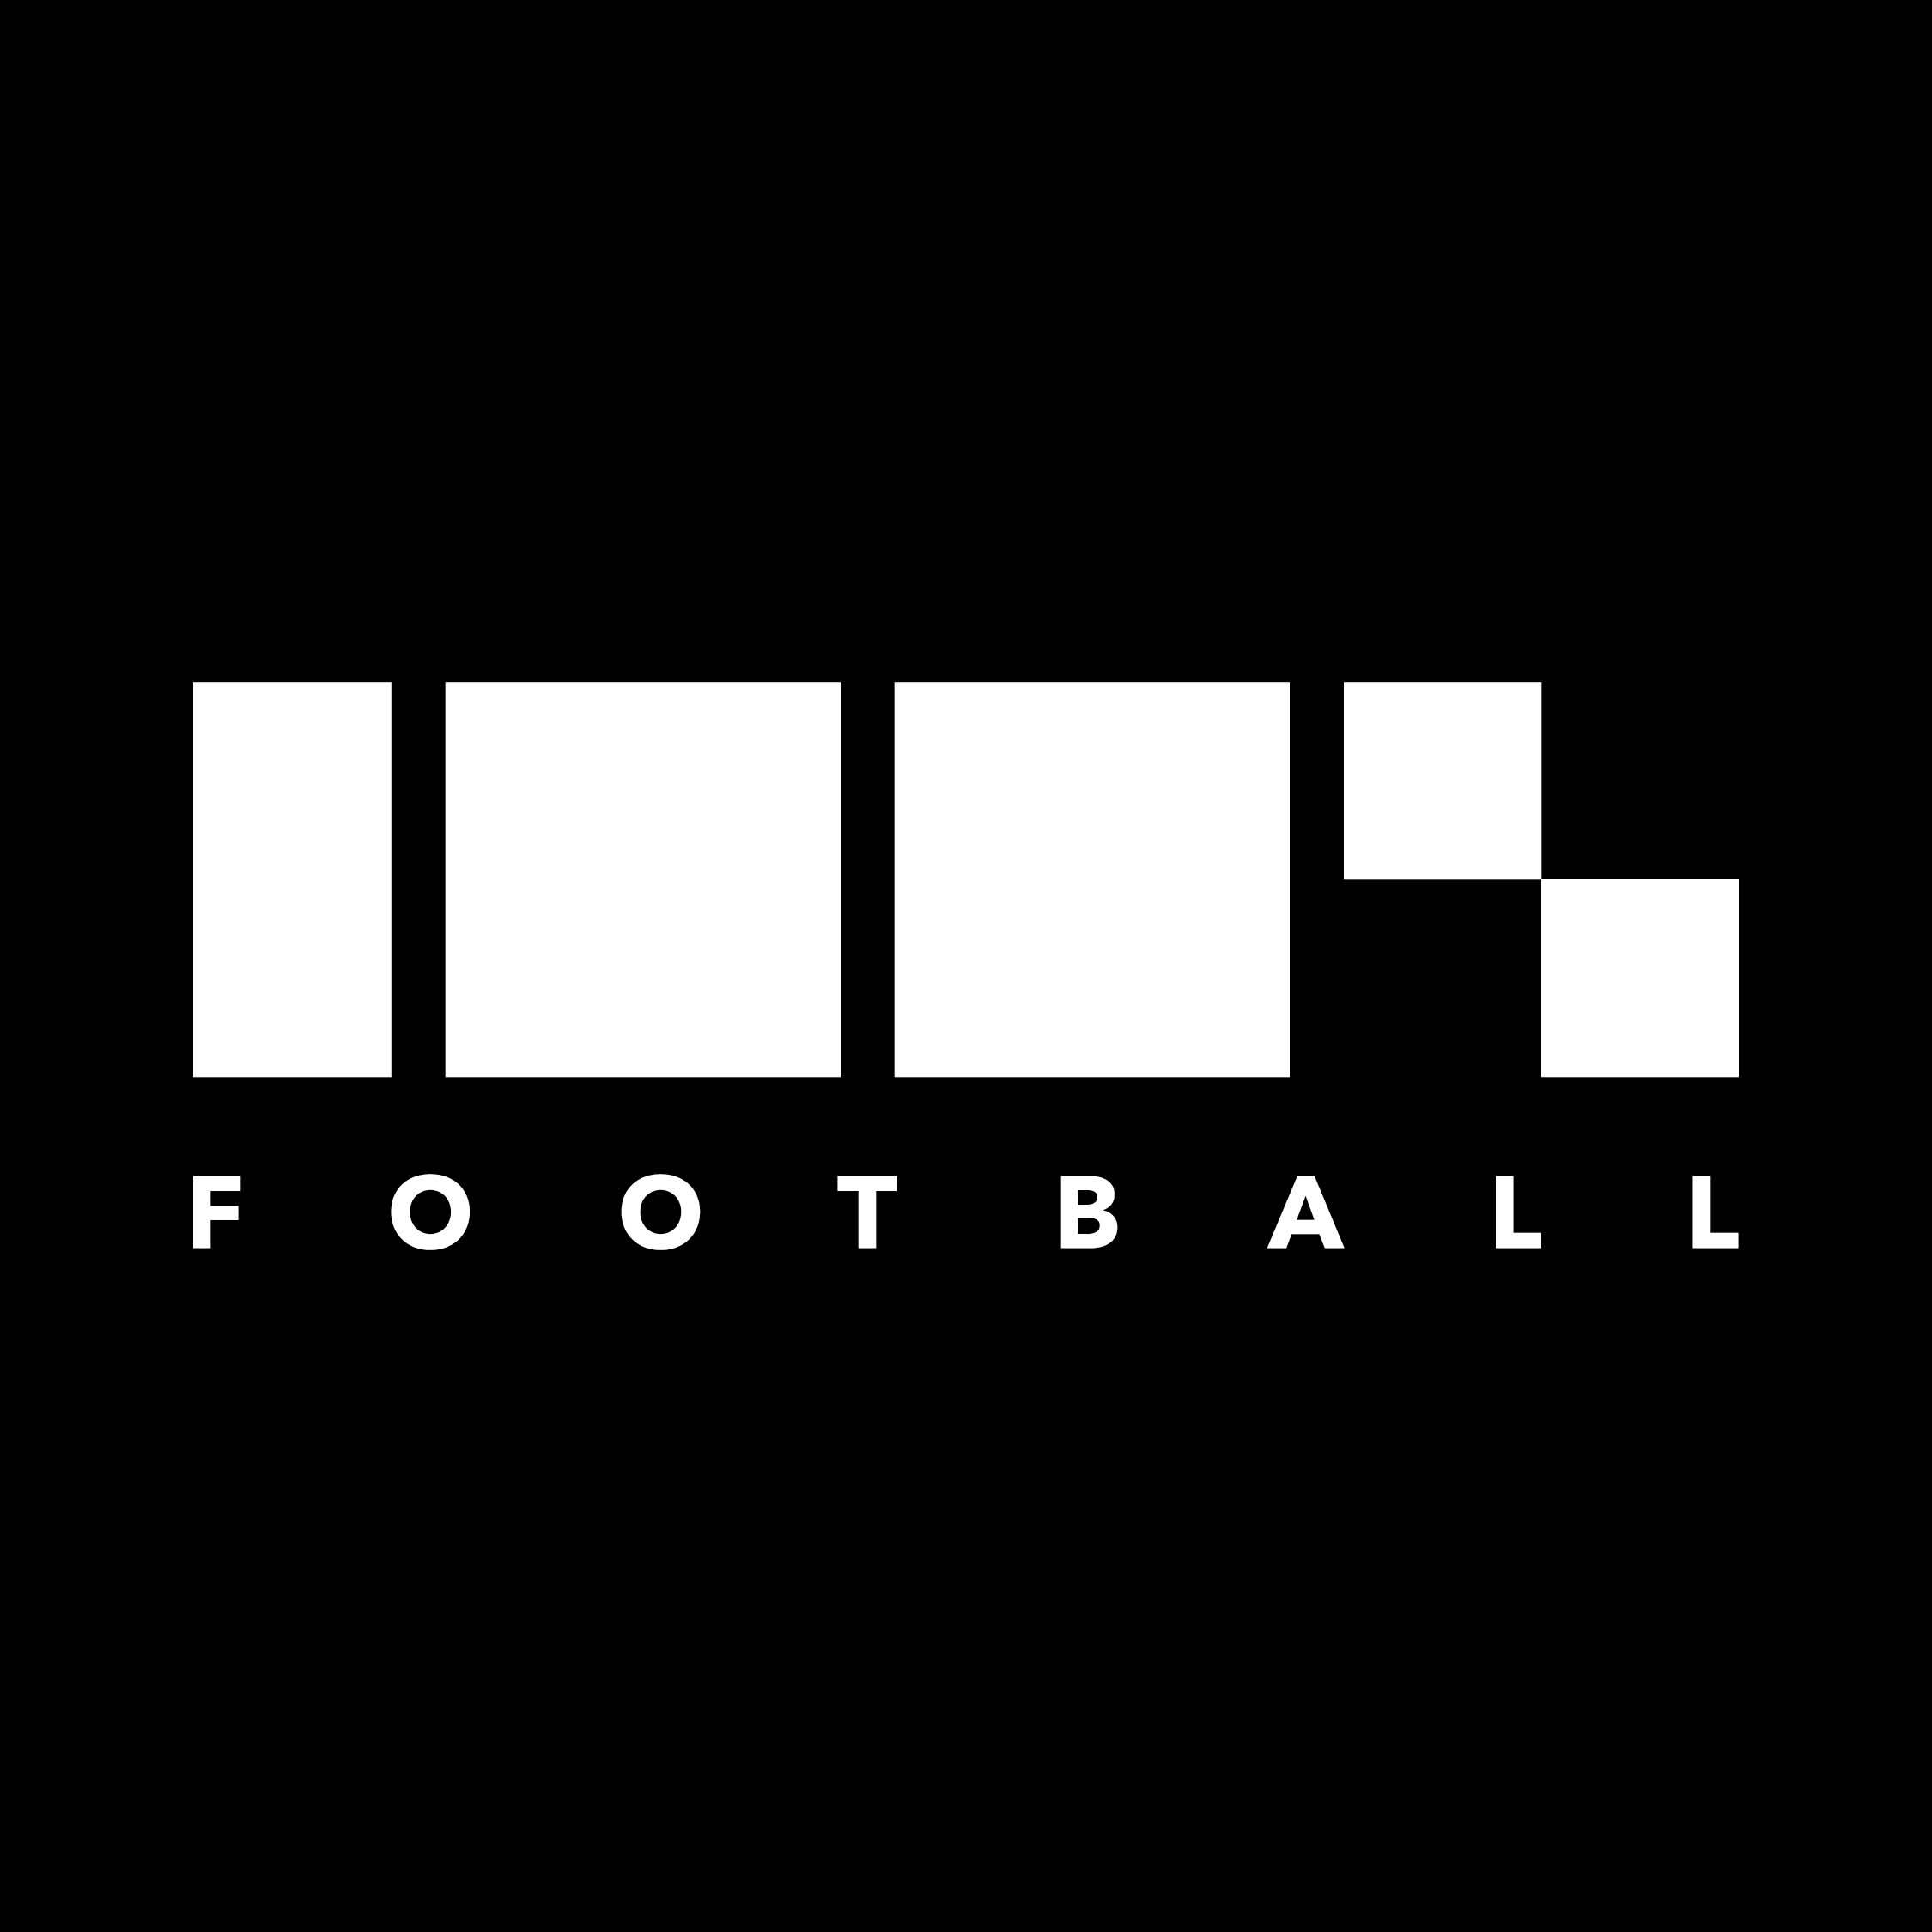 100% Football Enschede